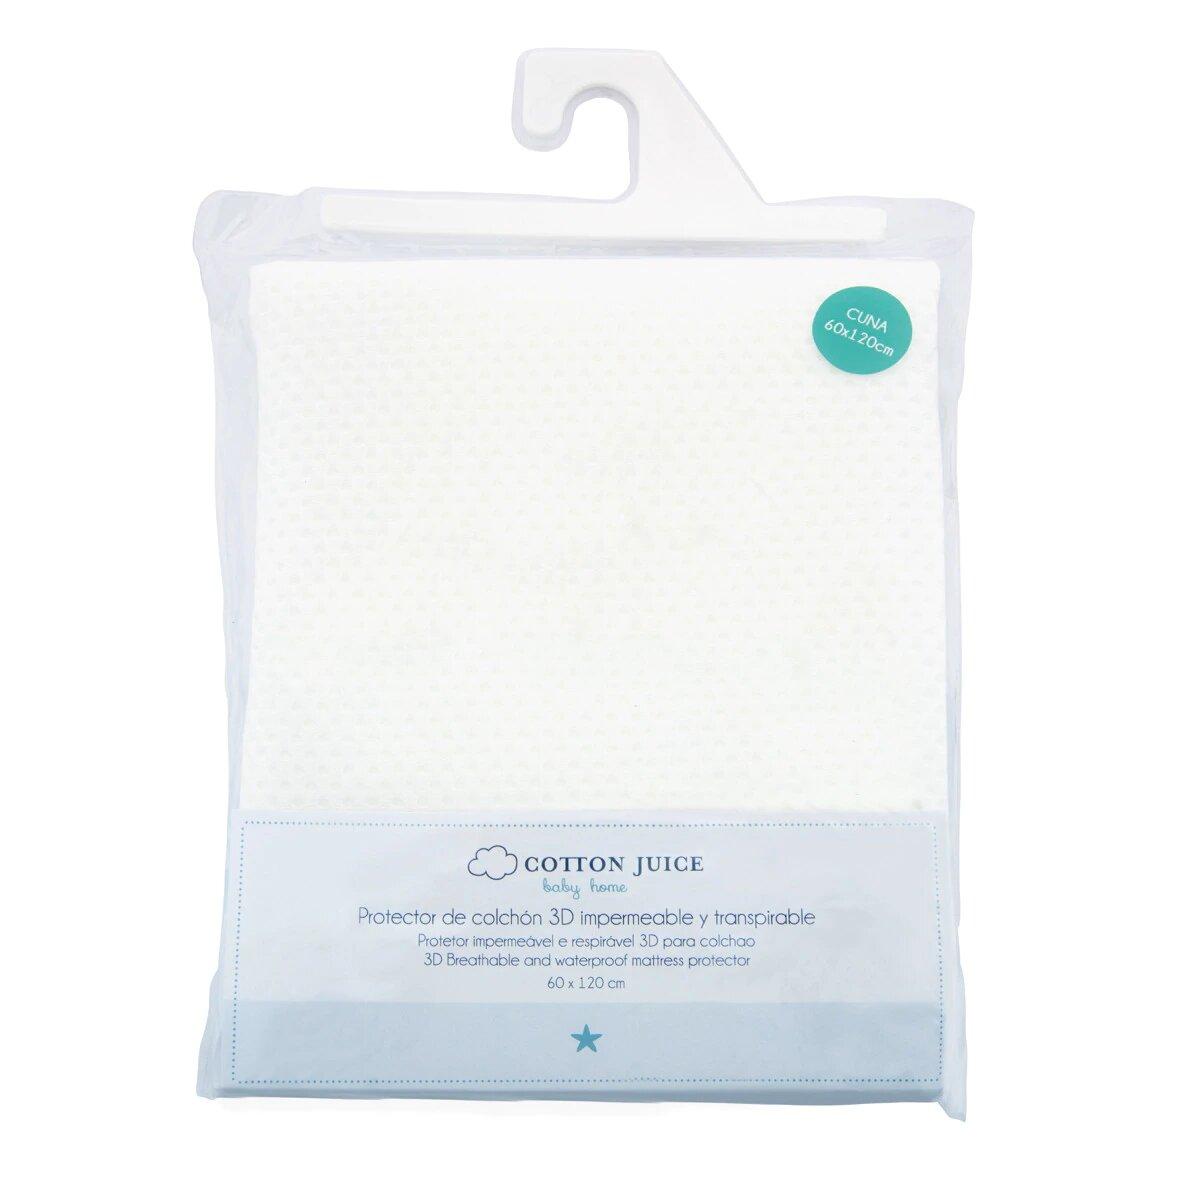 Protector para Colchón de Cuna (60 x 120 cm.) Cotton Juice Baby Home 3D blanco